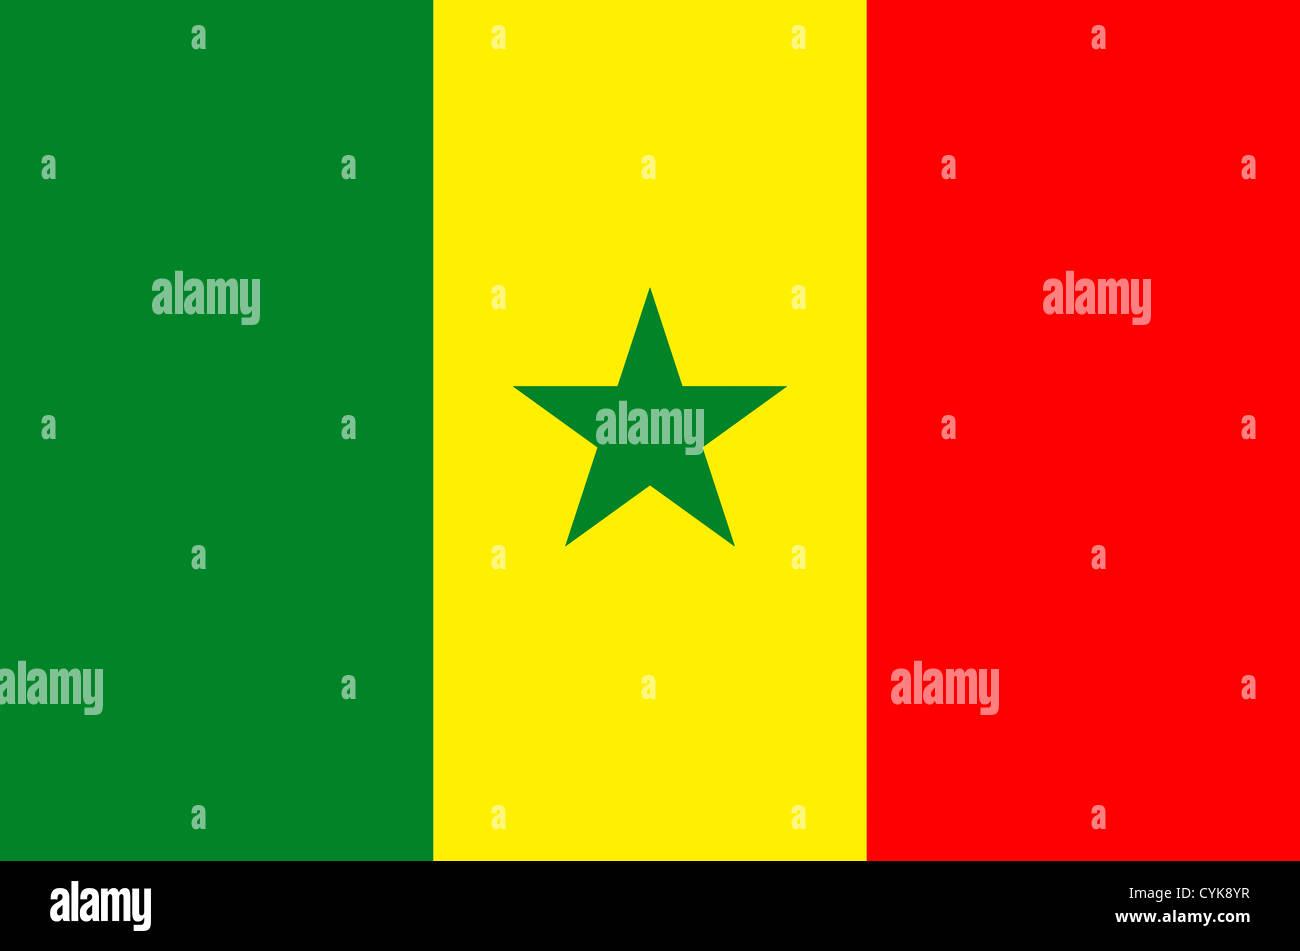 La bandera nacional de la República de Senegal. Imagen De Stock